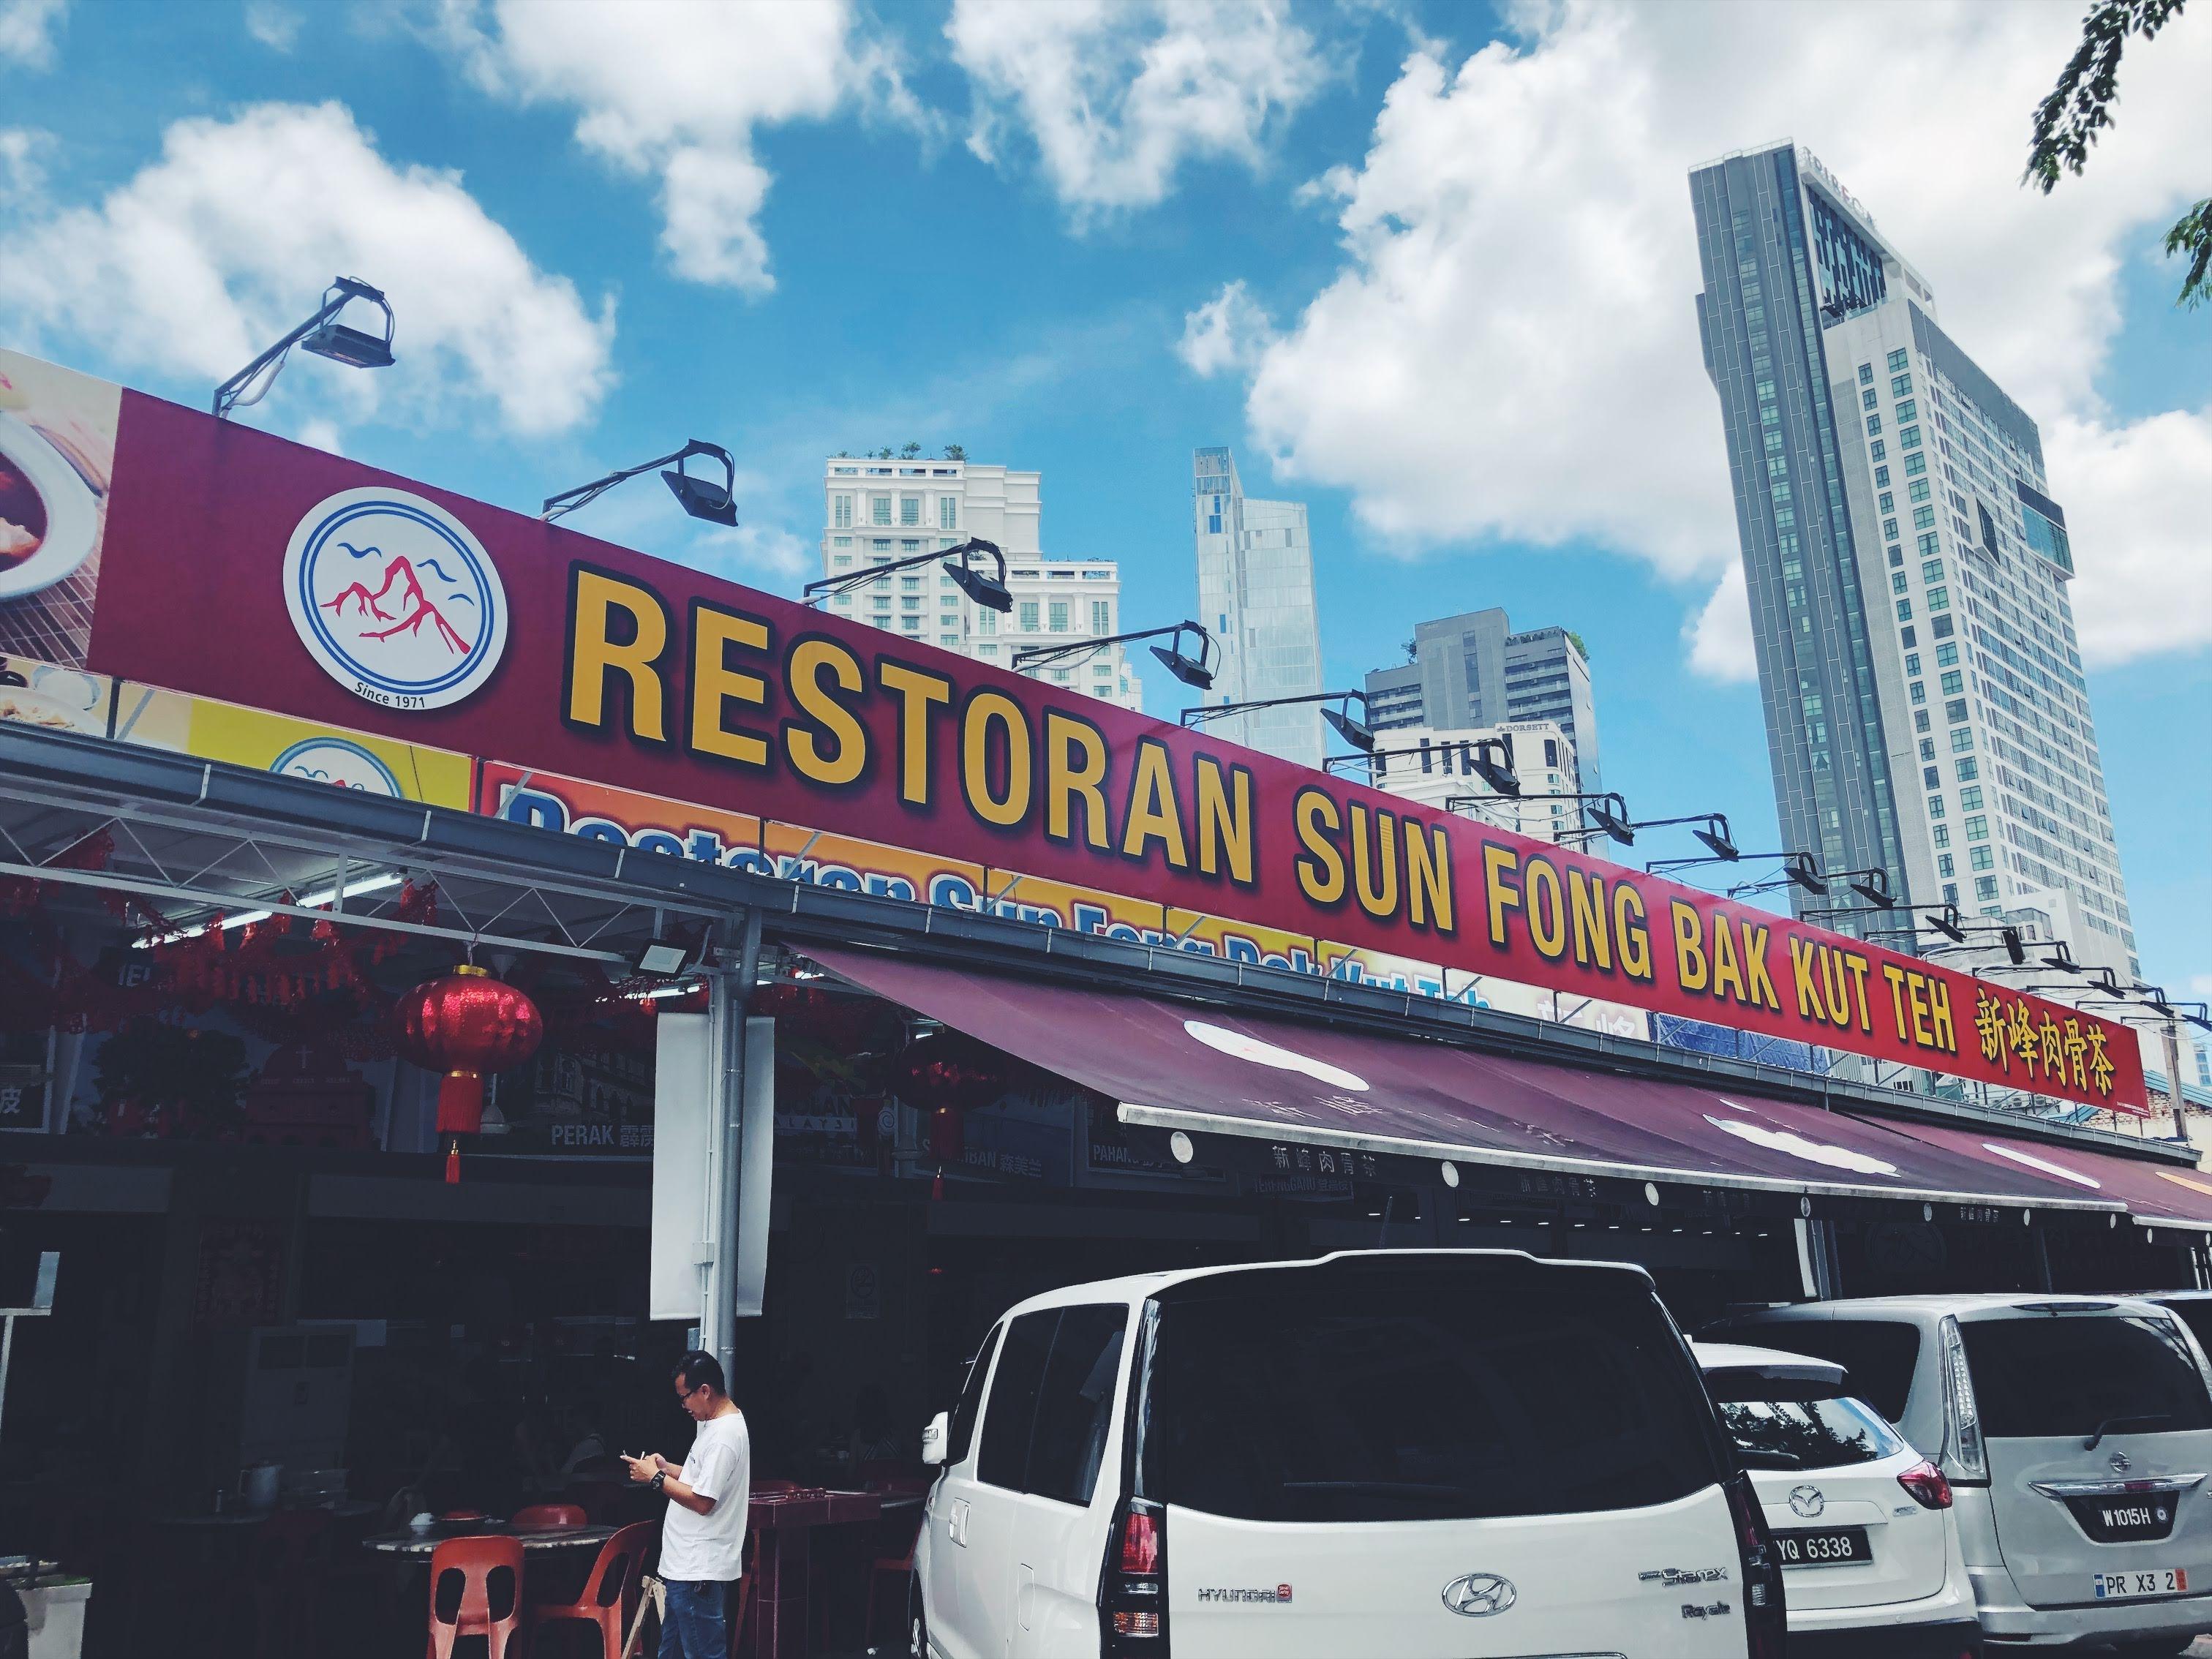 "Malaysia_BakKutTeh_SunFong_003"""""